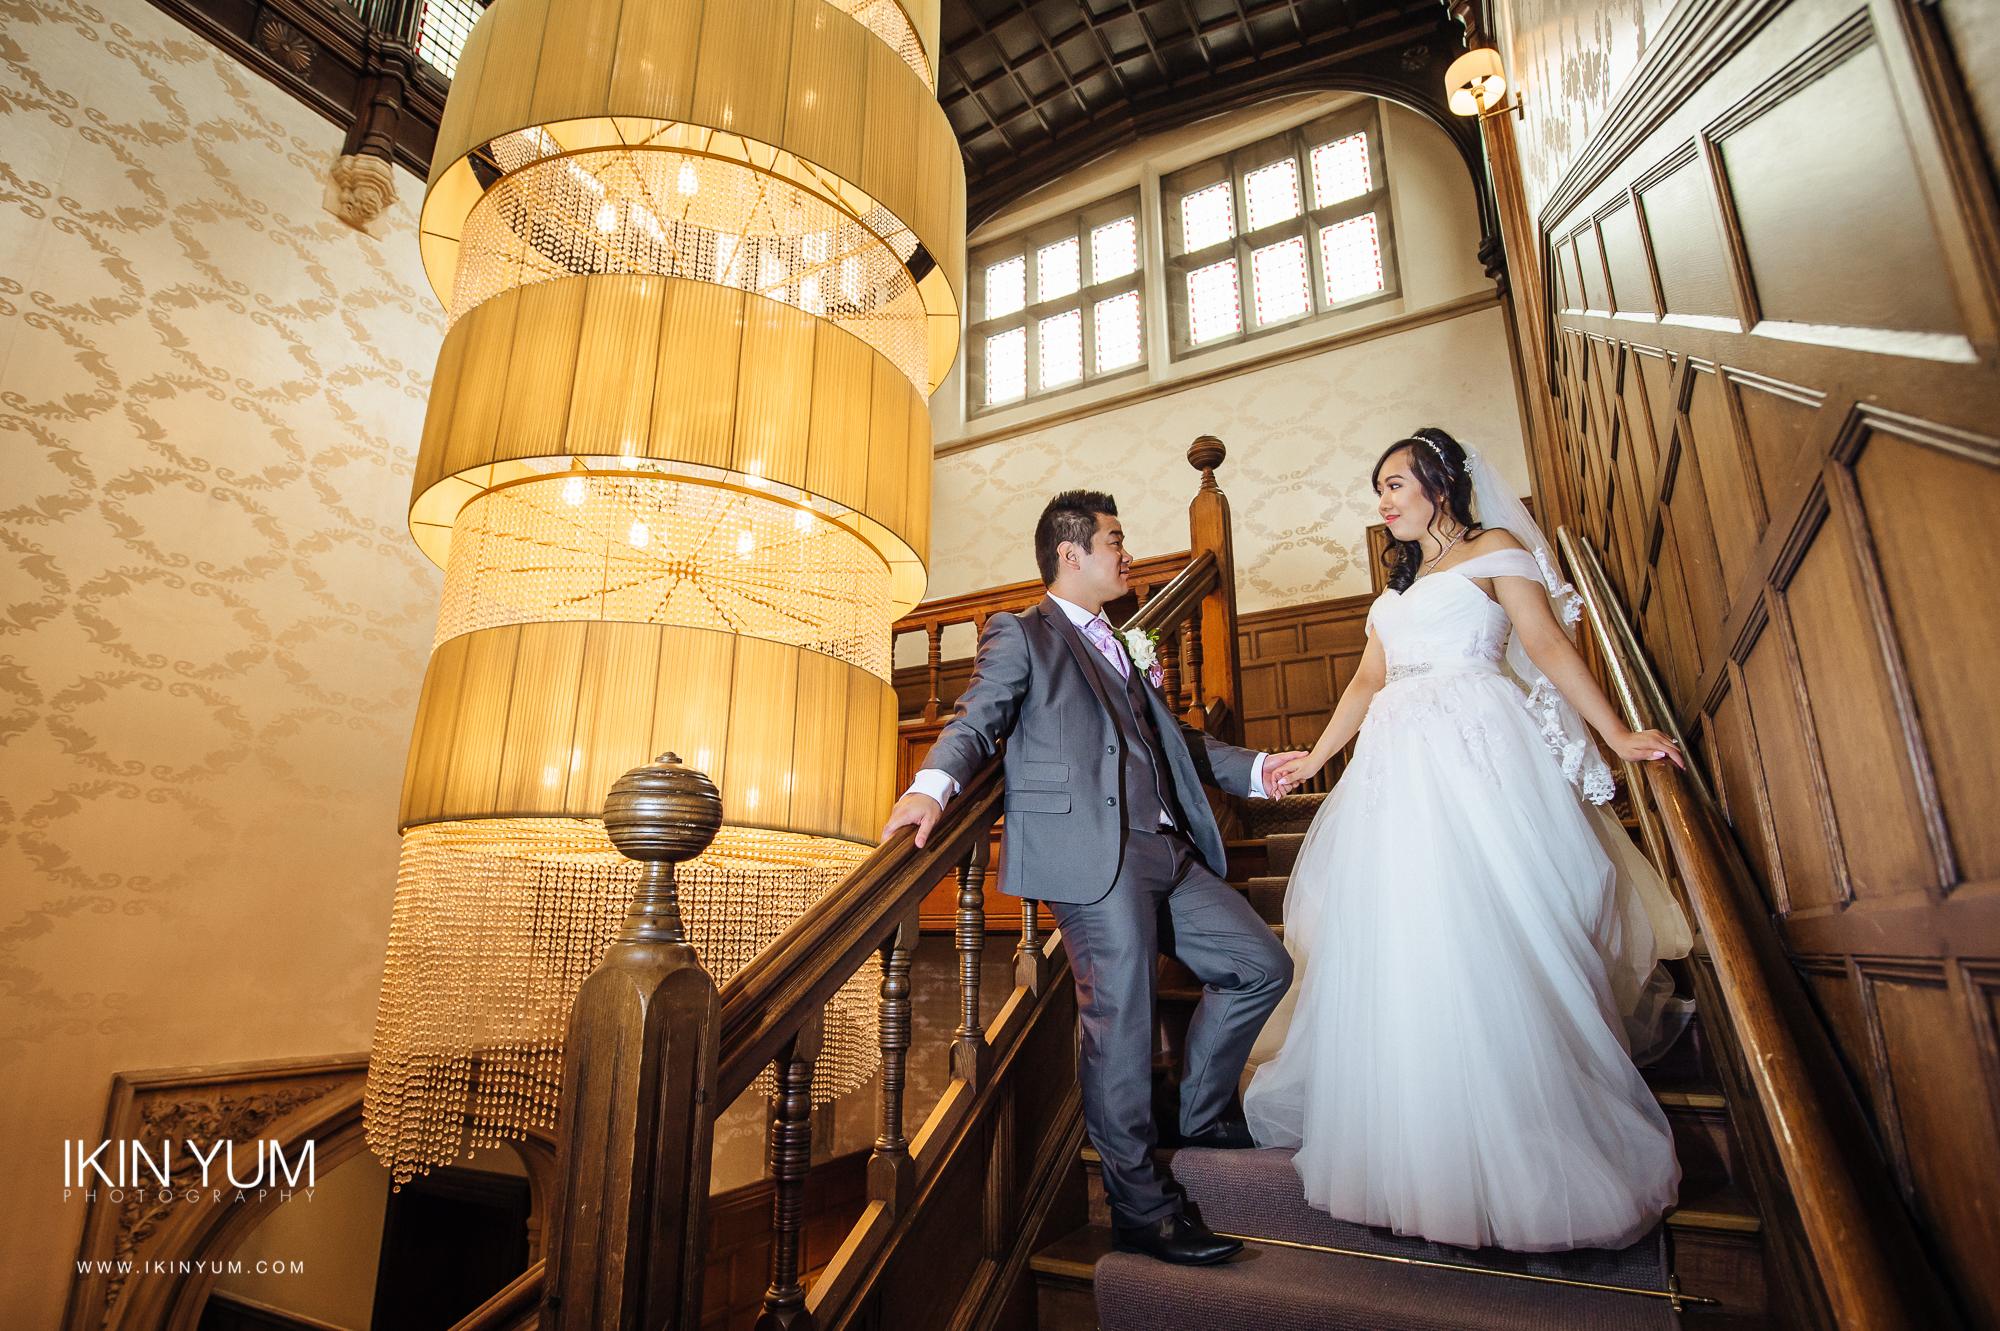 Hampton Manor Wedding - Ikin Yum Photography -111.jpg